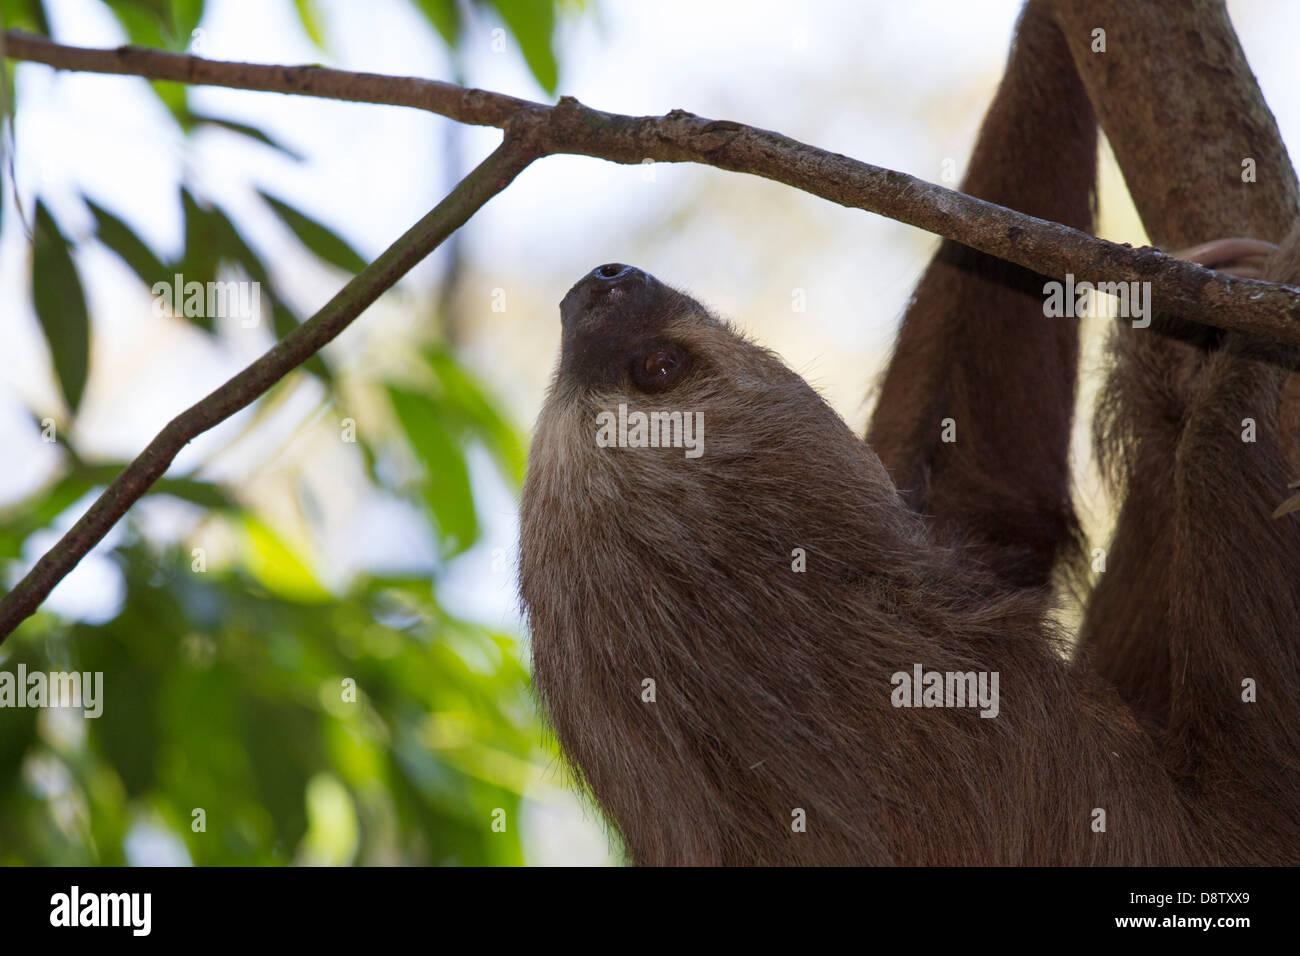 Brown-throated three-toed sloth, Bradypus variegatus, Cali Zoo, Cali, Colombia Stock Photo